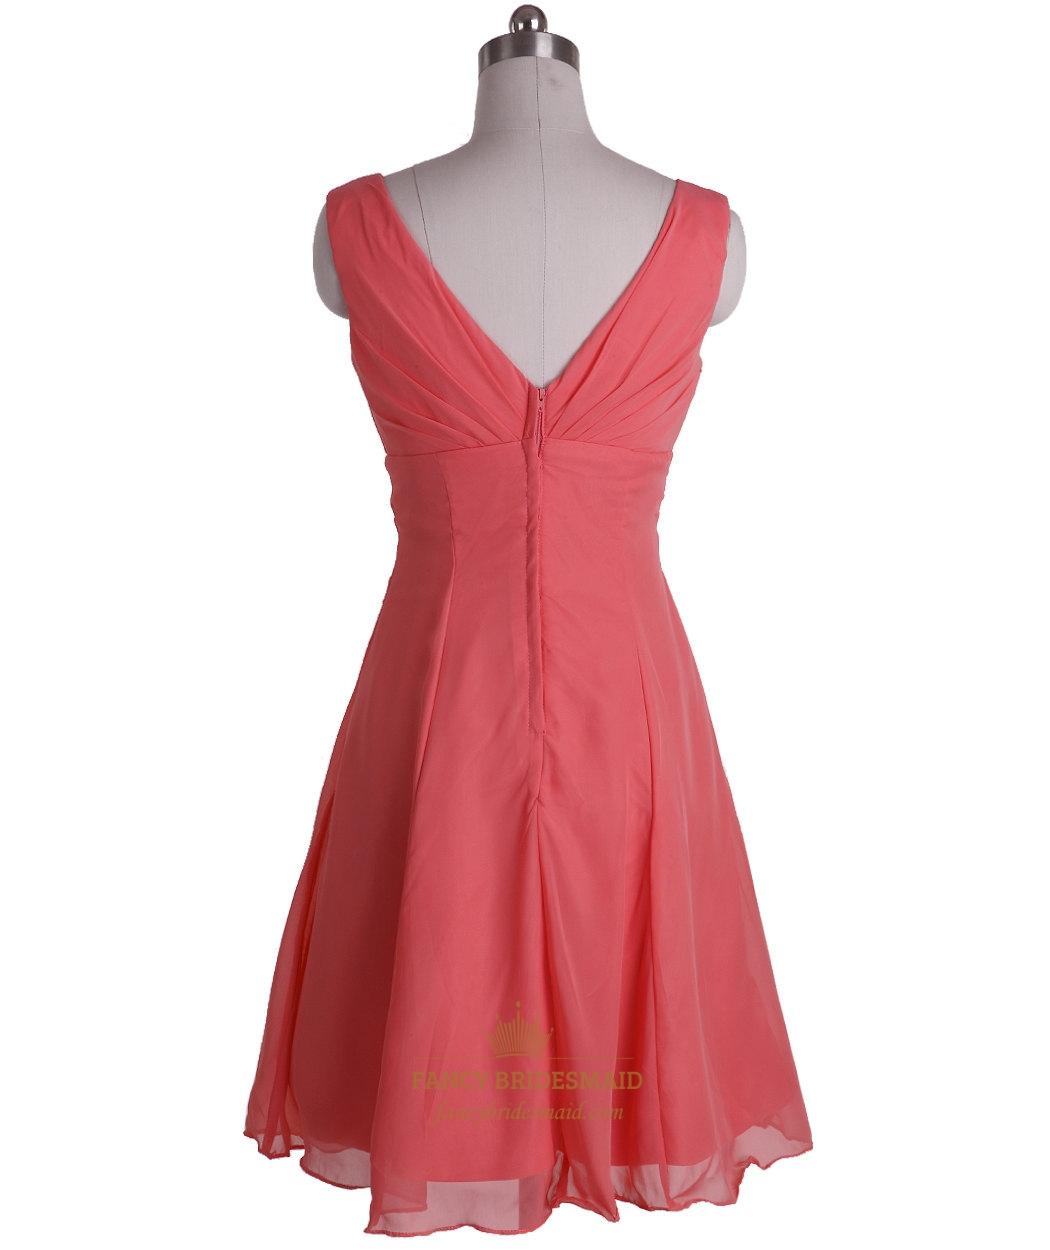 coral chiffon empire waist aline vneck sleeveless short